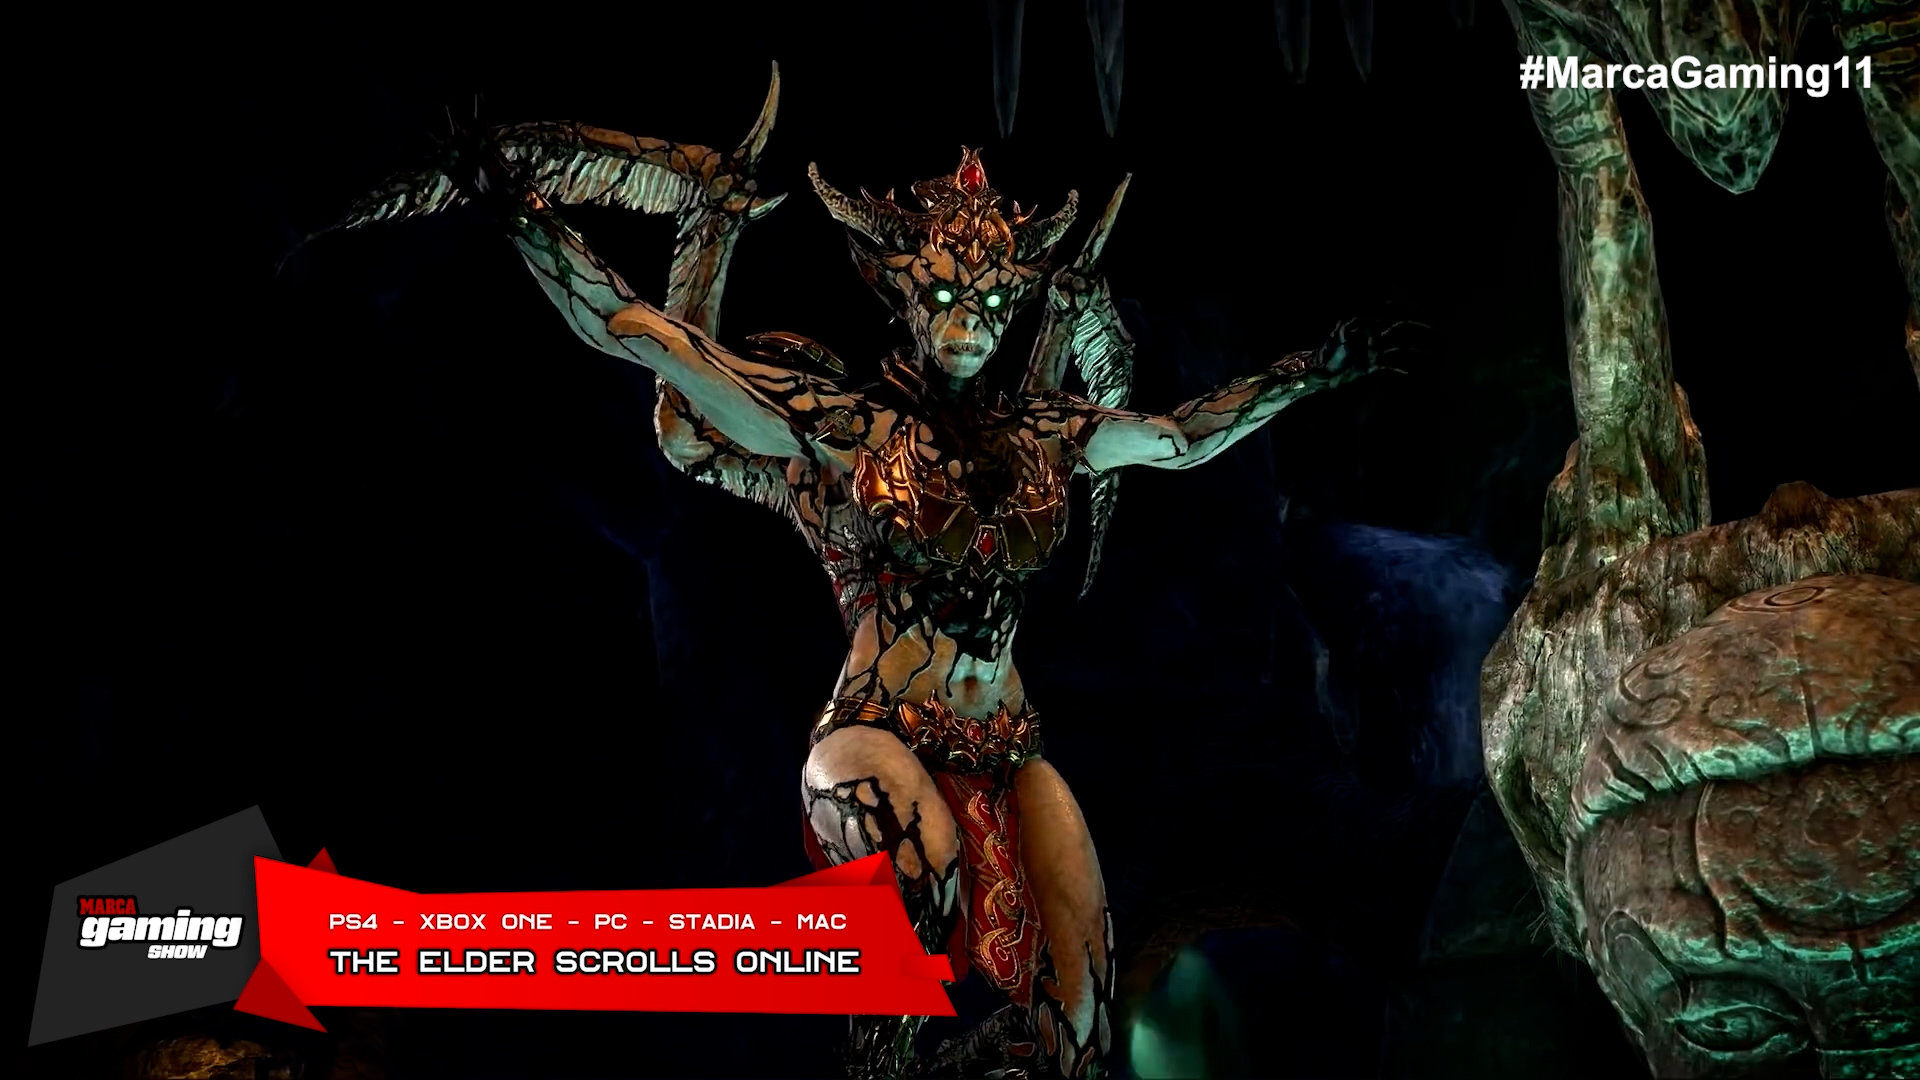 The Elder Scrolls Online ( PS4 - XBOX ONE - PC - STADIA - MAC )